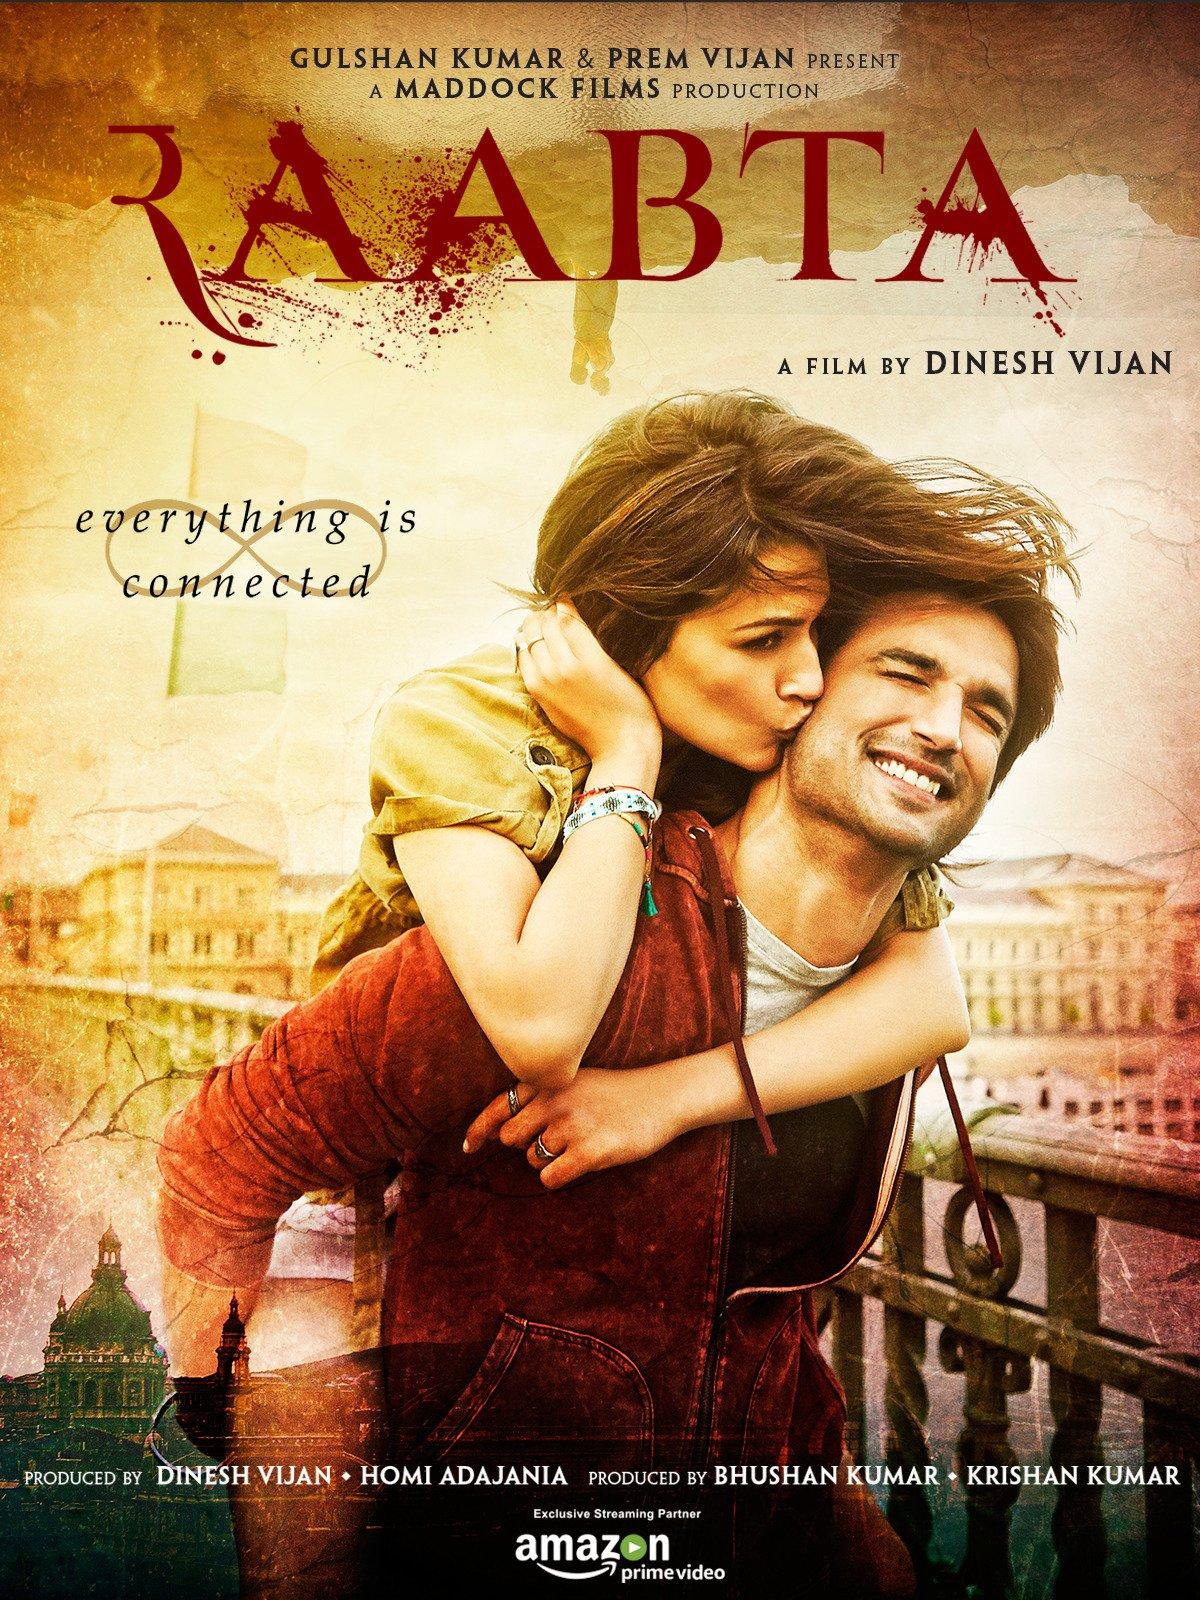 Amazon com: Watch Raabta | Prime Video